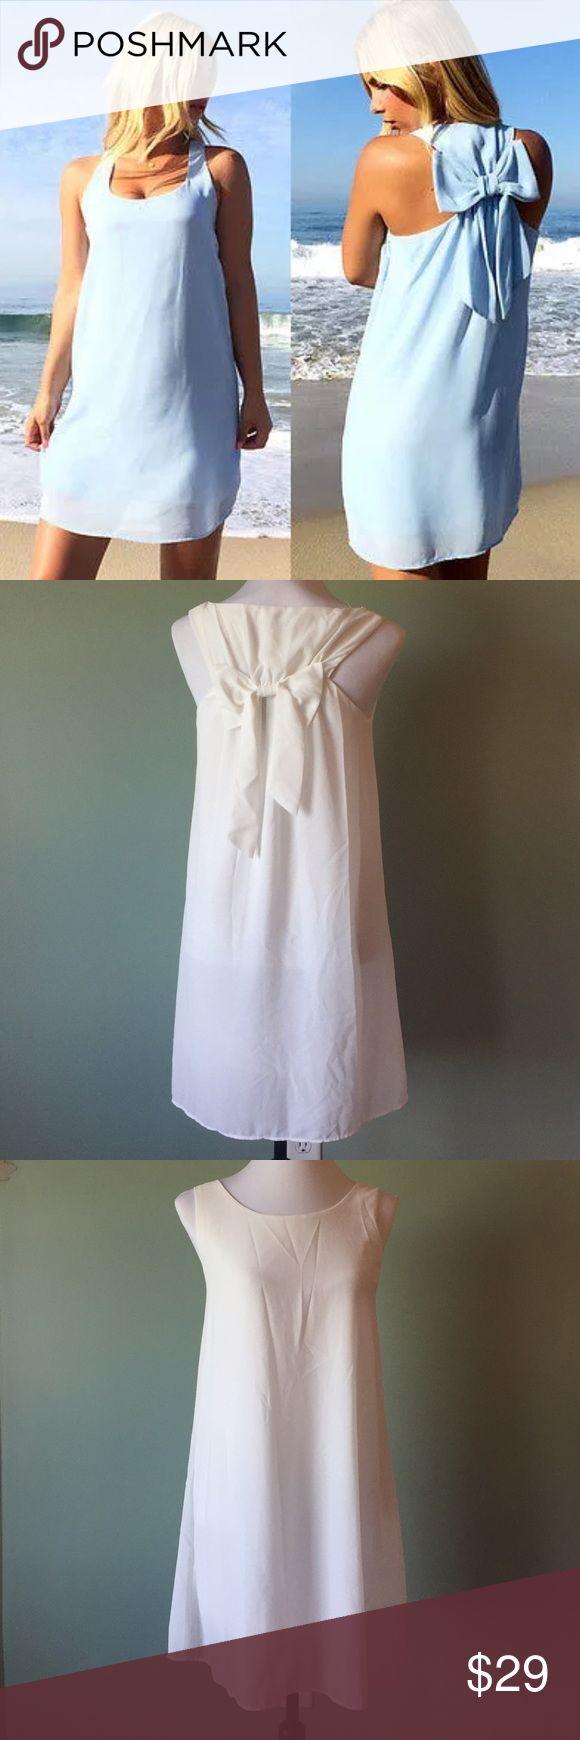 White bow back dress BNWT medium Brand new with tags. Gorgeous white bow back dress. Flowy and fully lined. So pretty. Size medium Dresses Mini